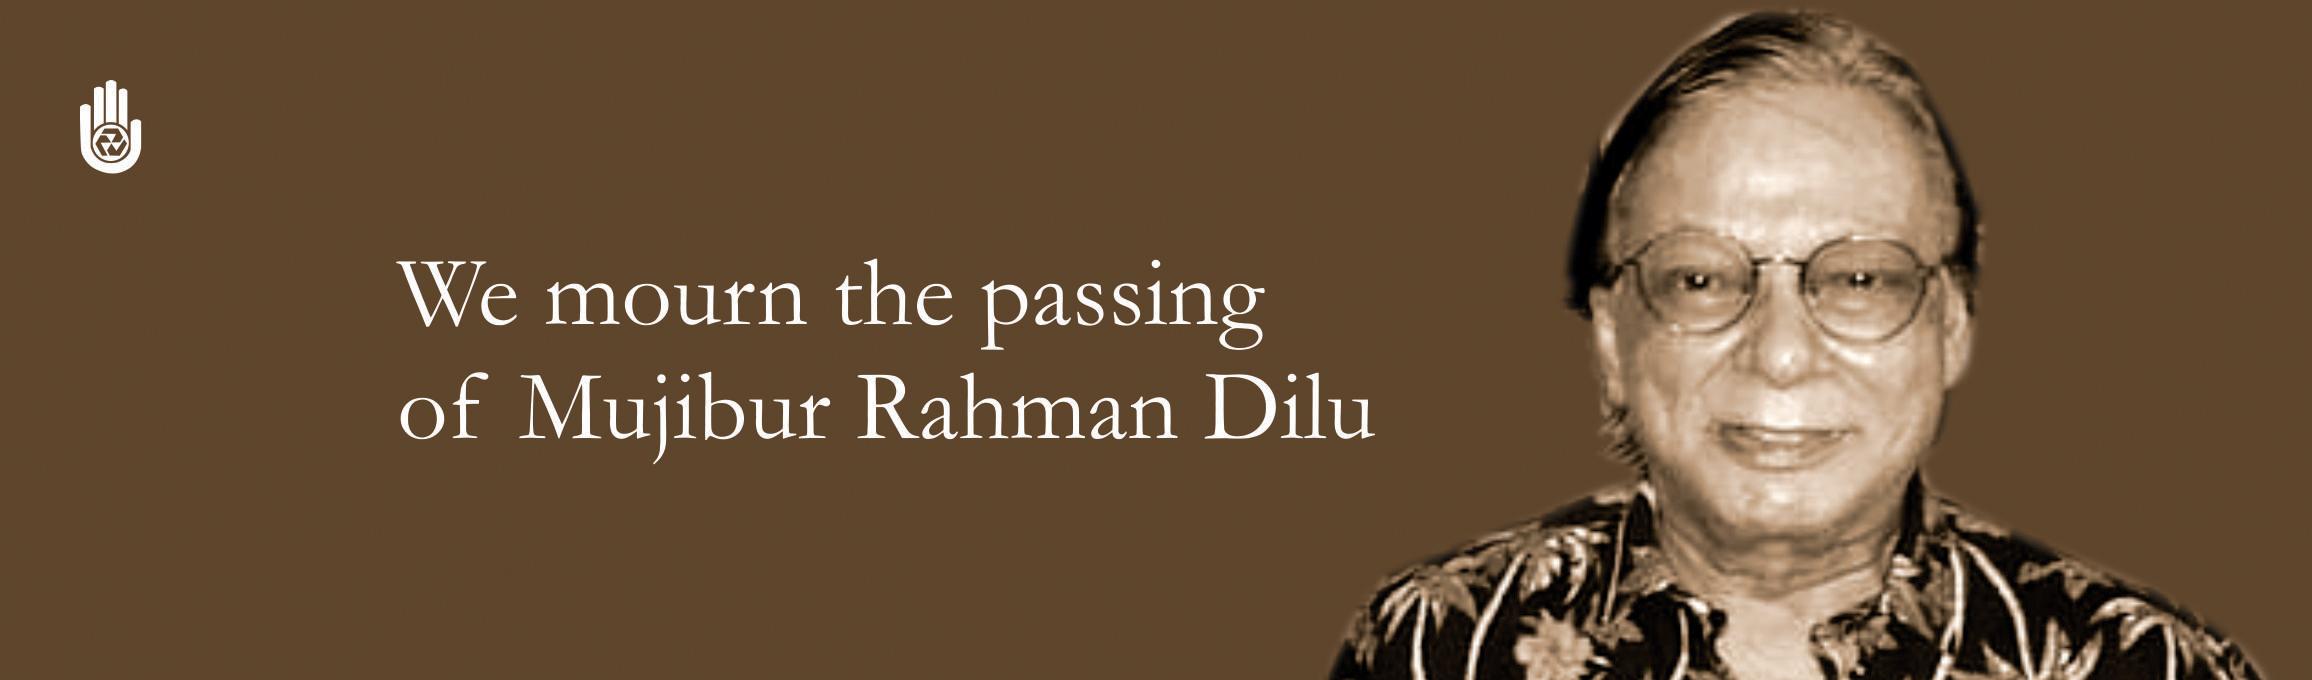 We mourn the passing of Mujibur Rahman Dilu